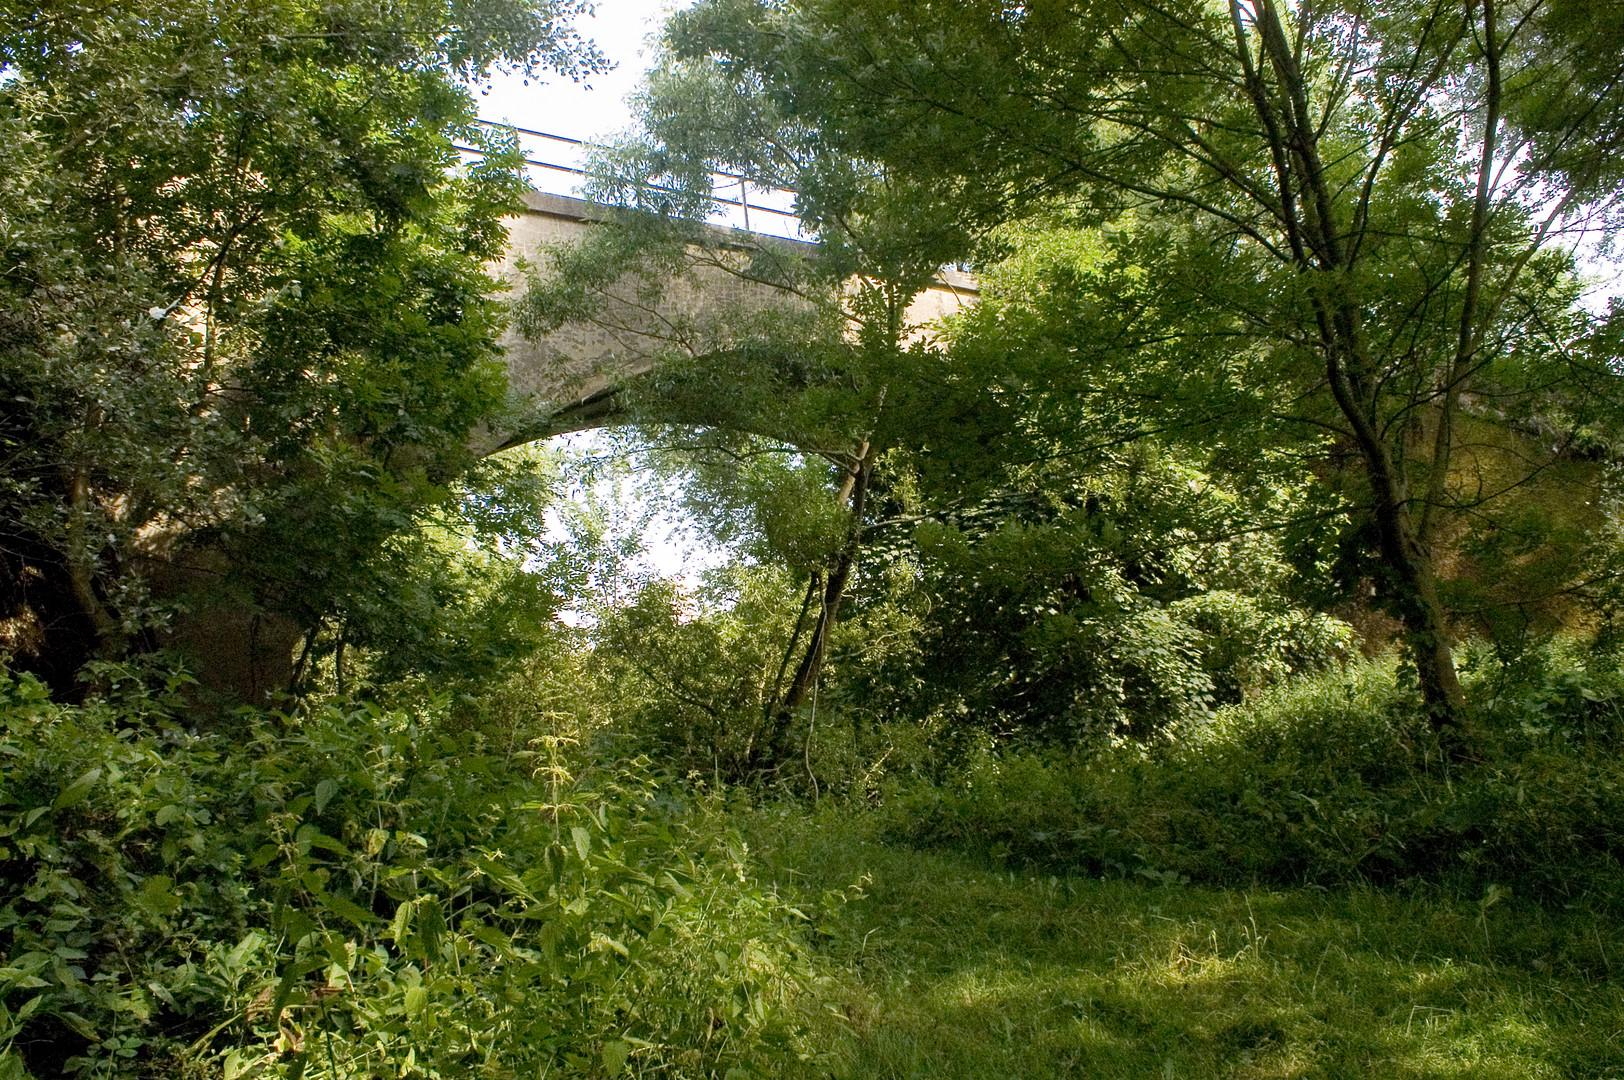 Eisenbahnbrücke über die Lumda